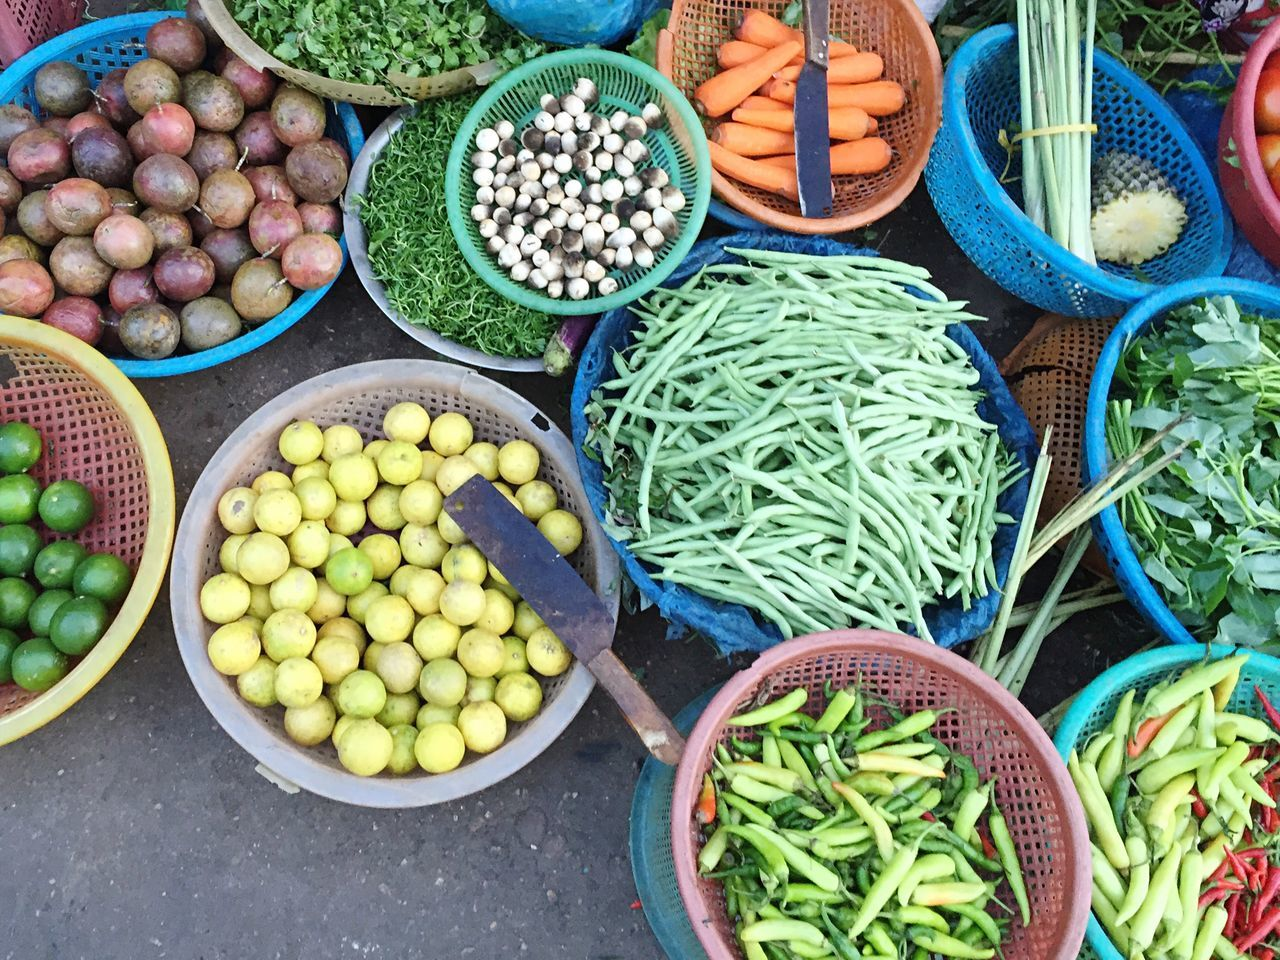 Food Photography Fresh Vegetables Fruits And Vegetables Market Taking Photos Hoi An Vietnam Food Porn Awards